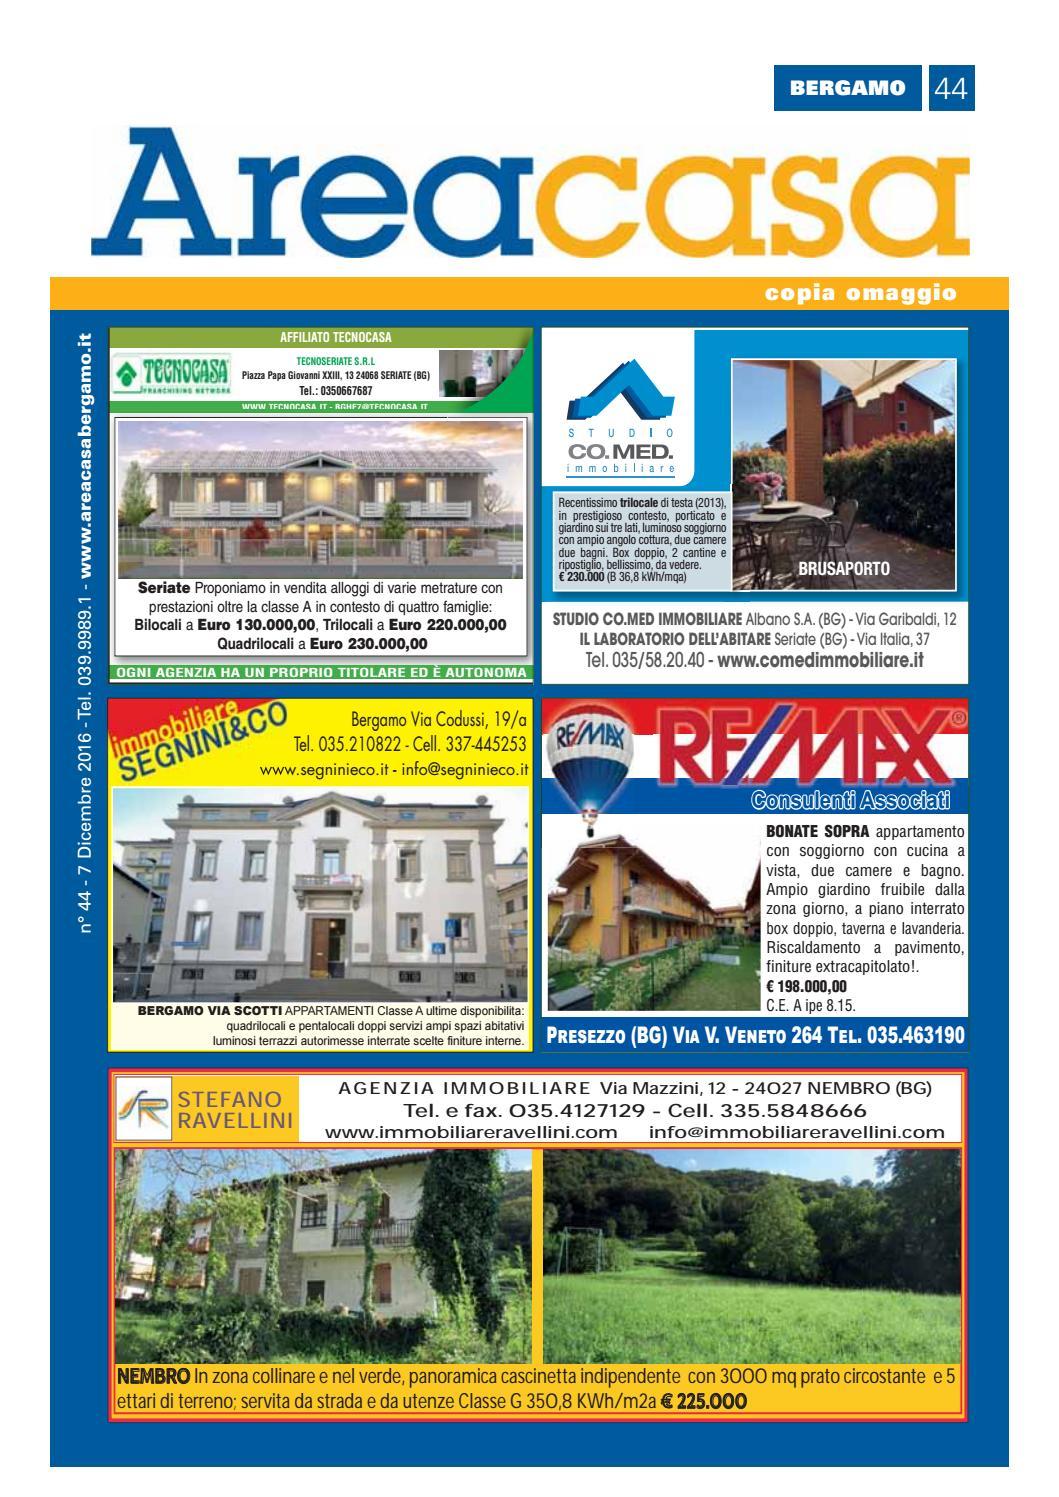 Areacasa Bergamo 44 By Netweek Issuu